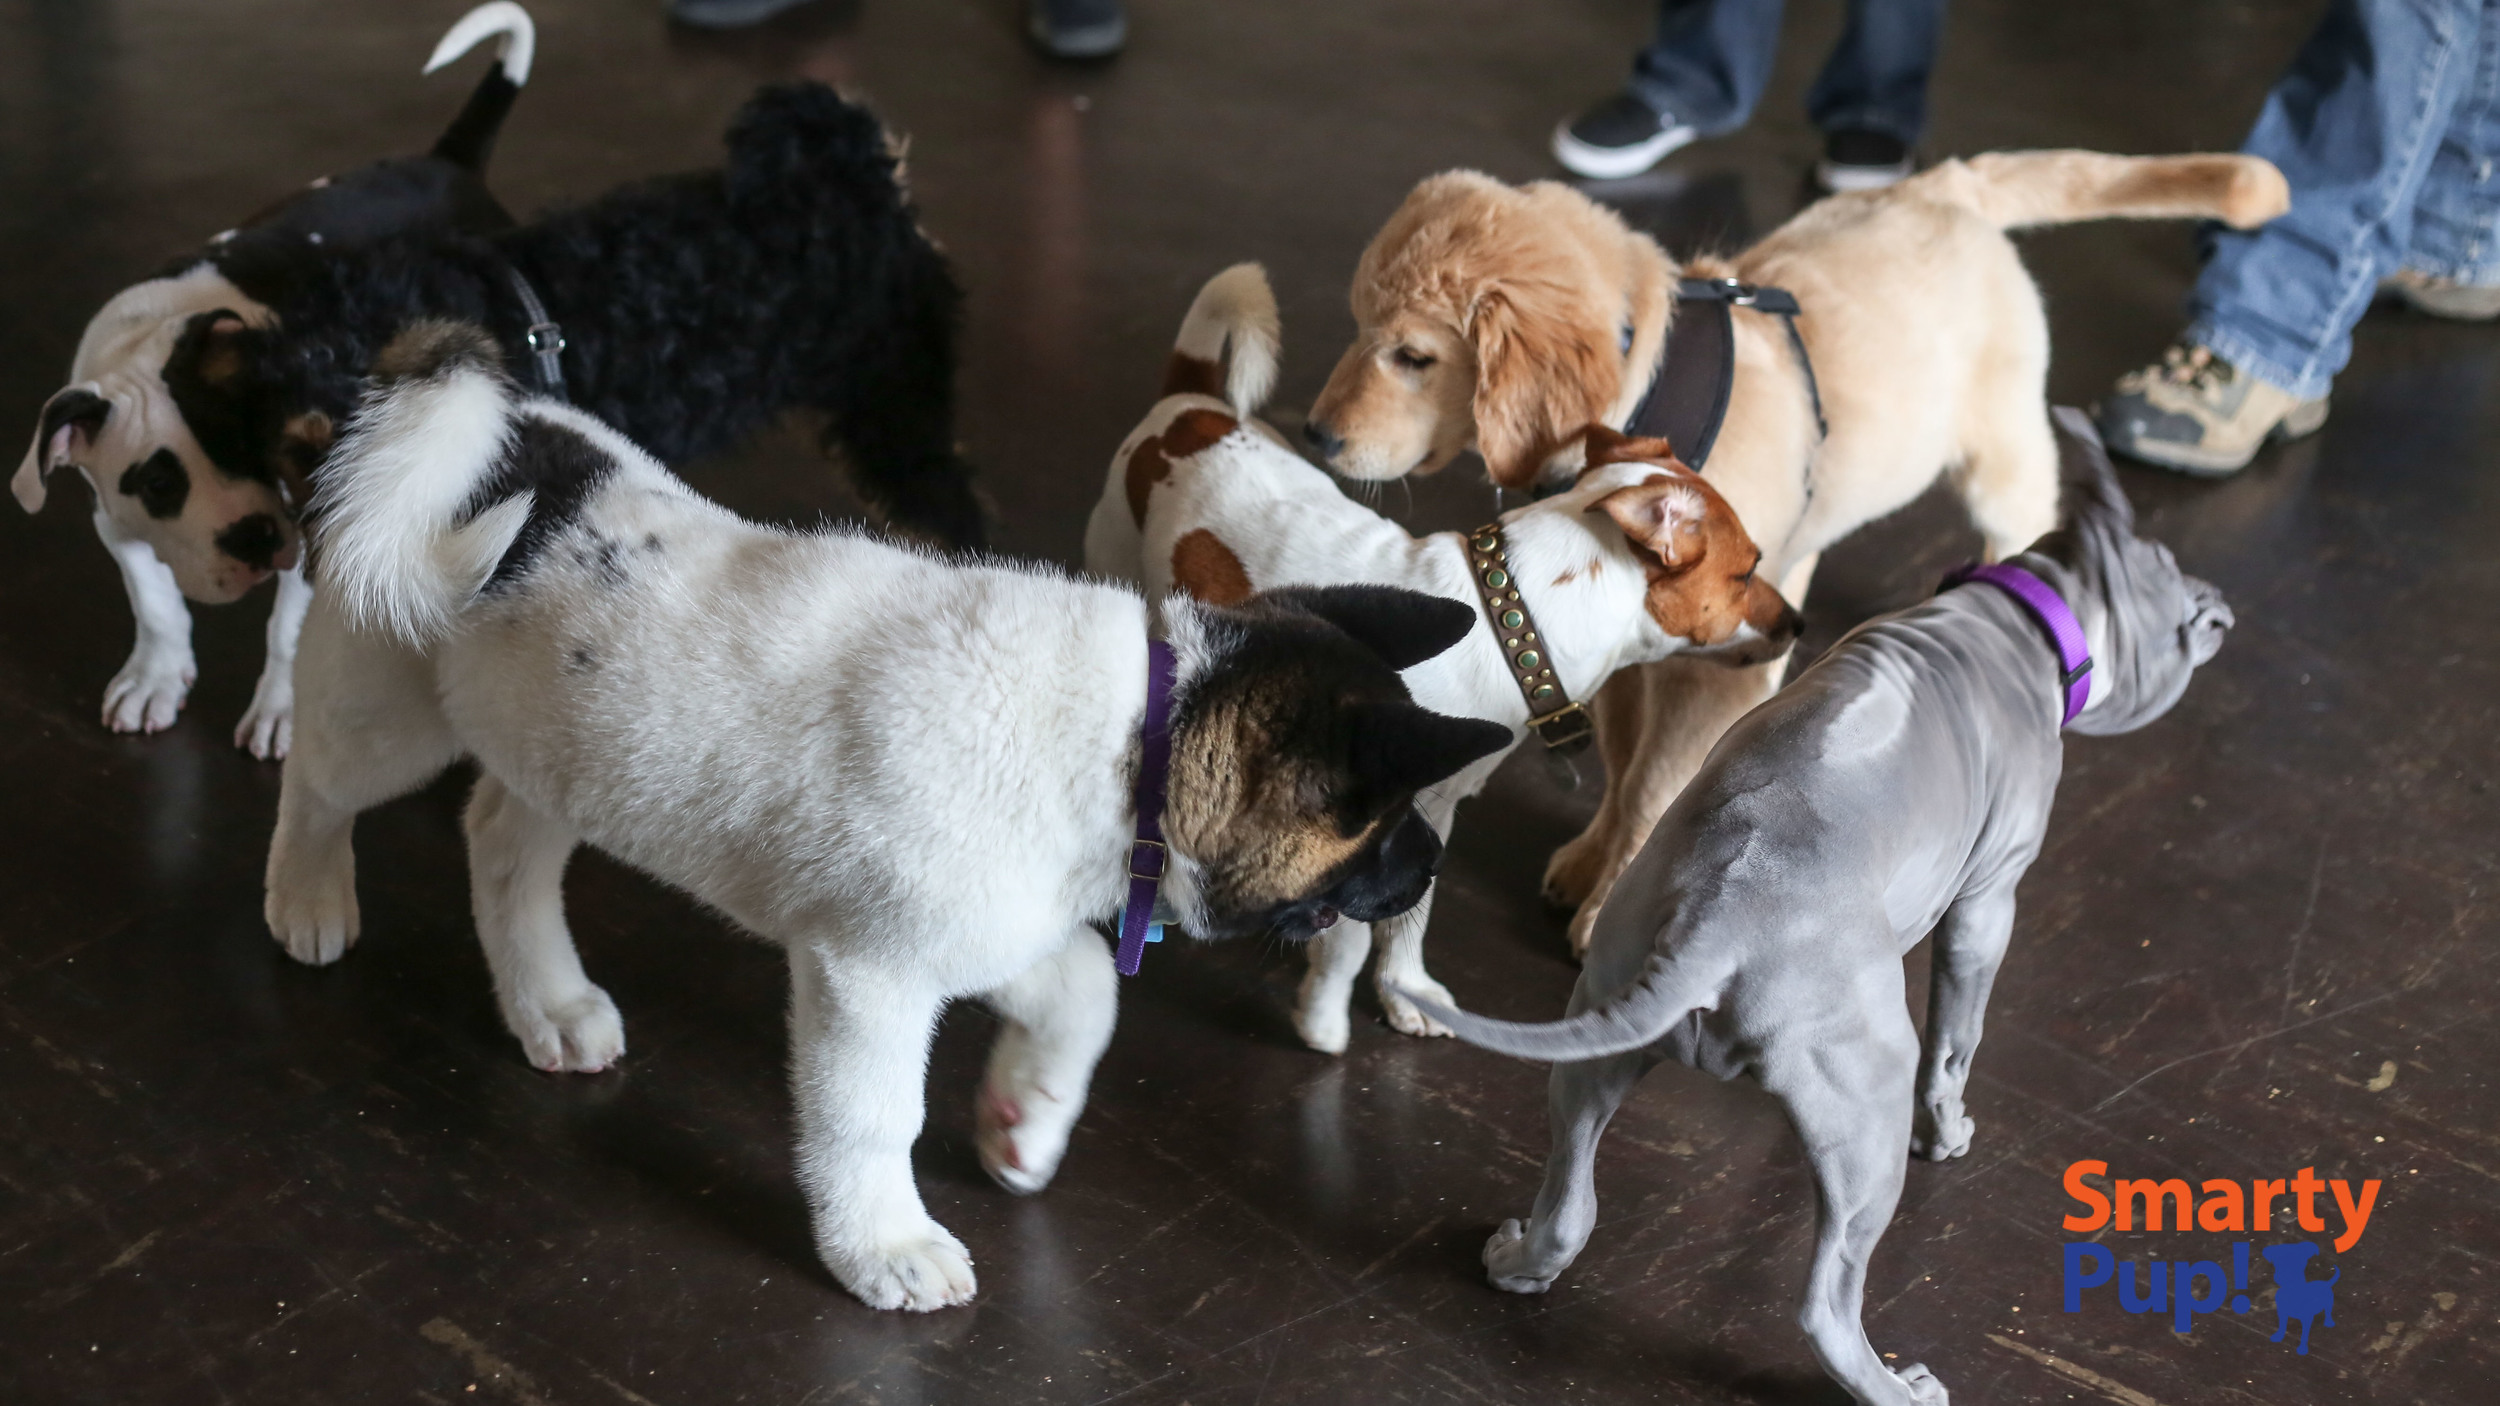 puppy-piles-2104-03-08-0976.jpg